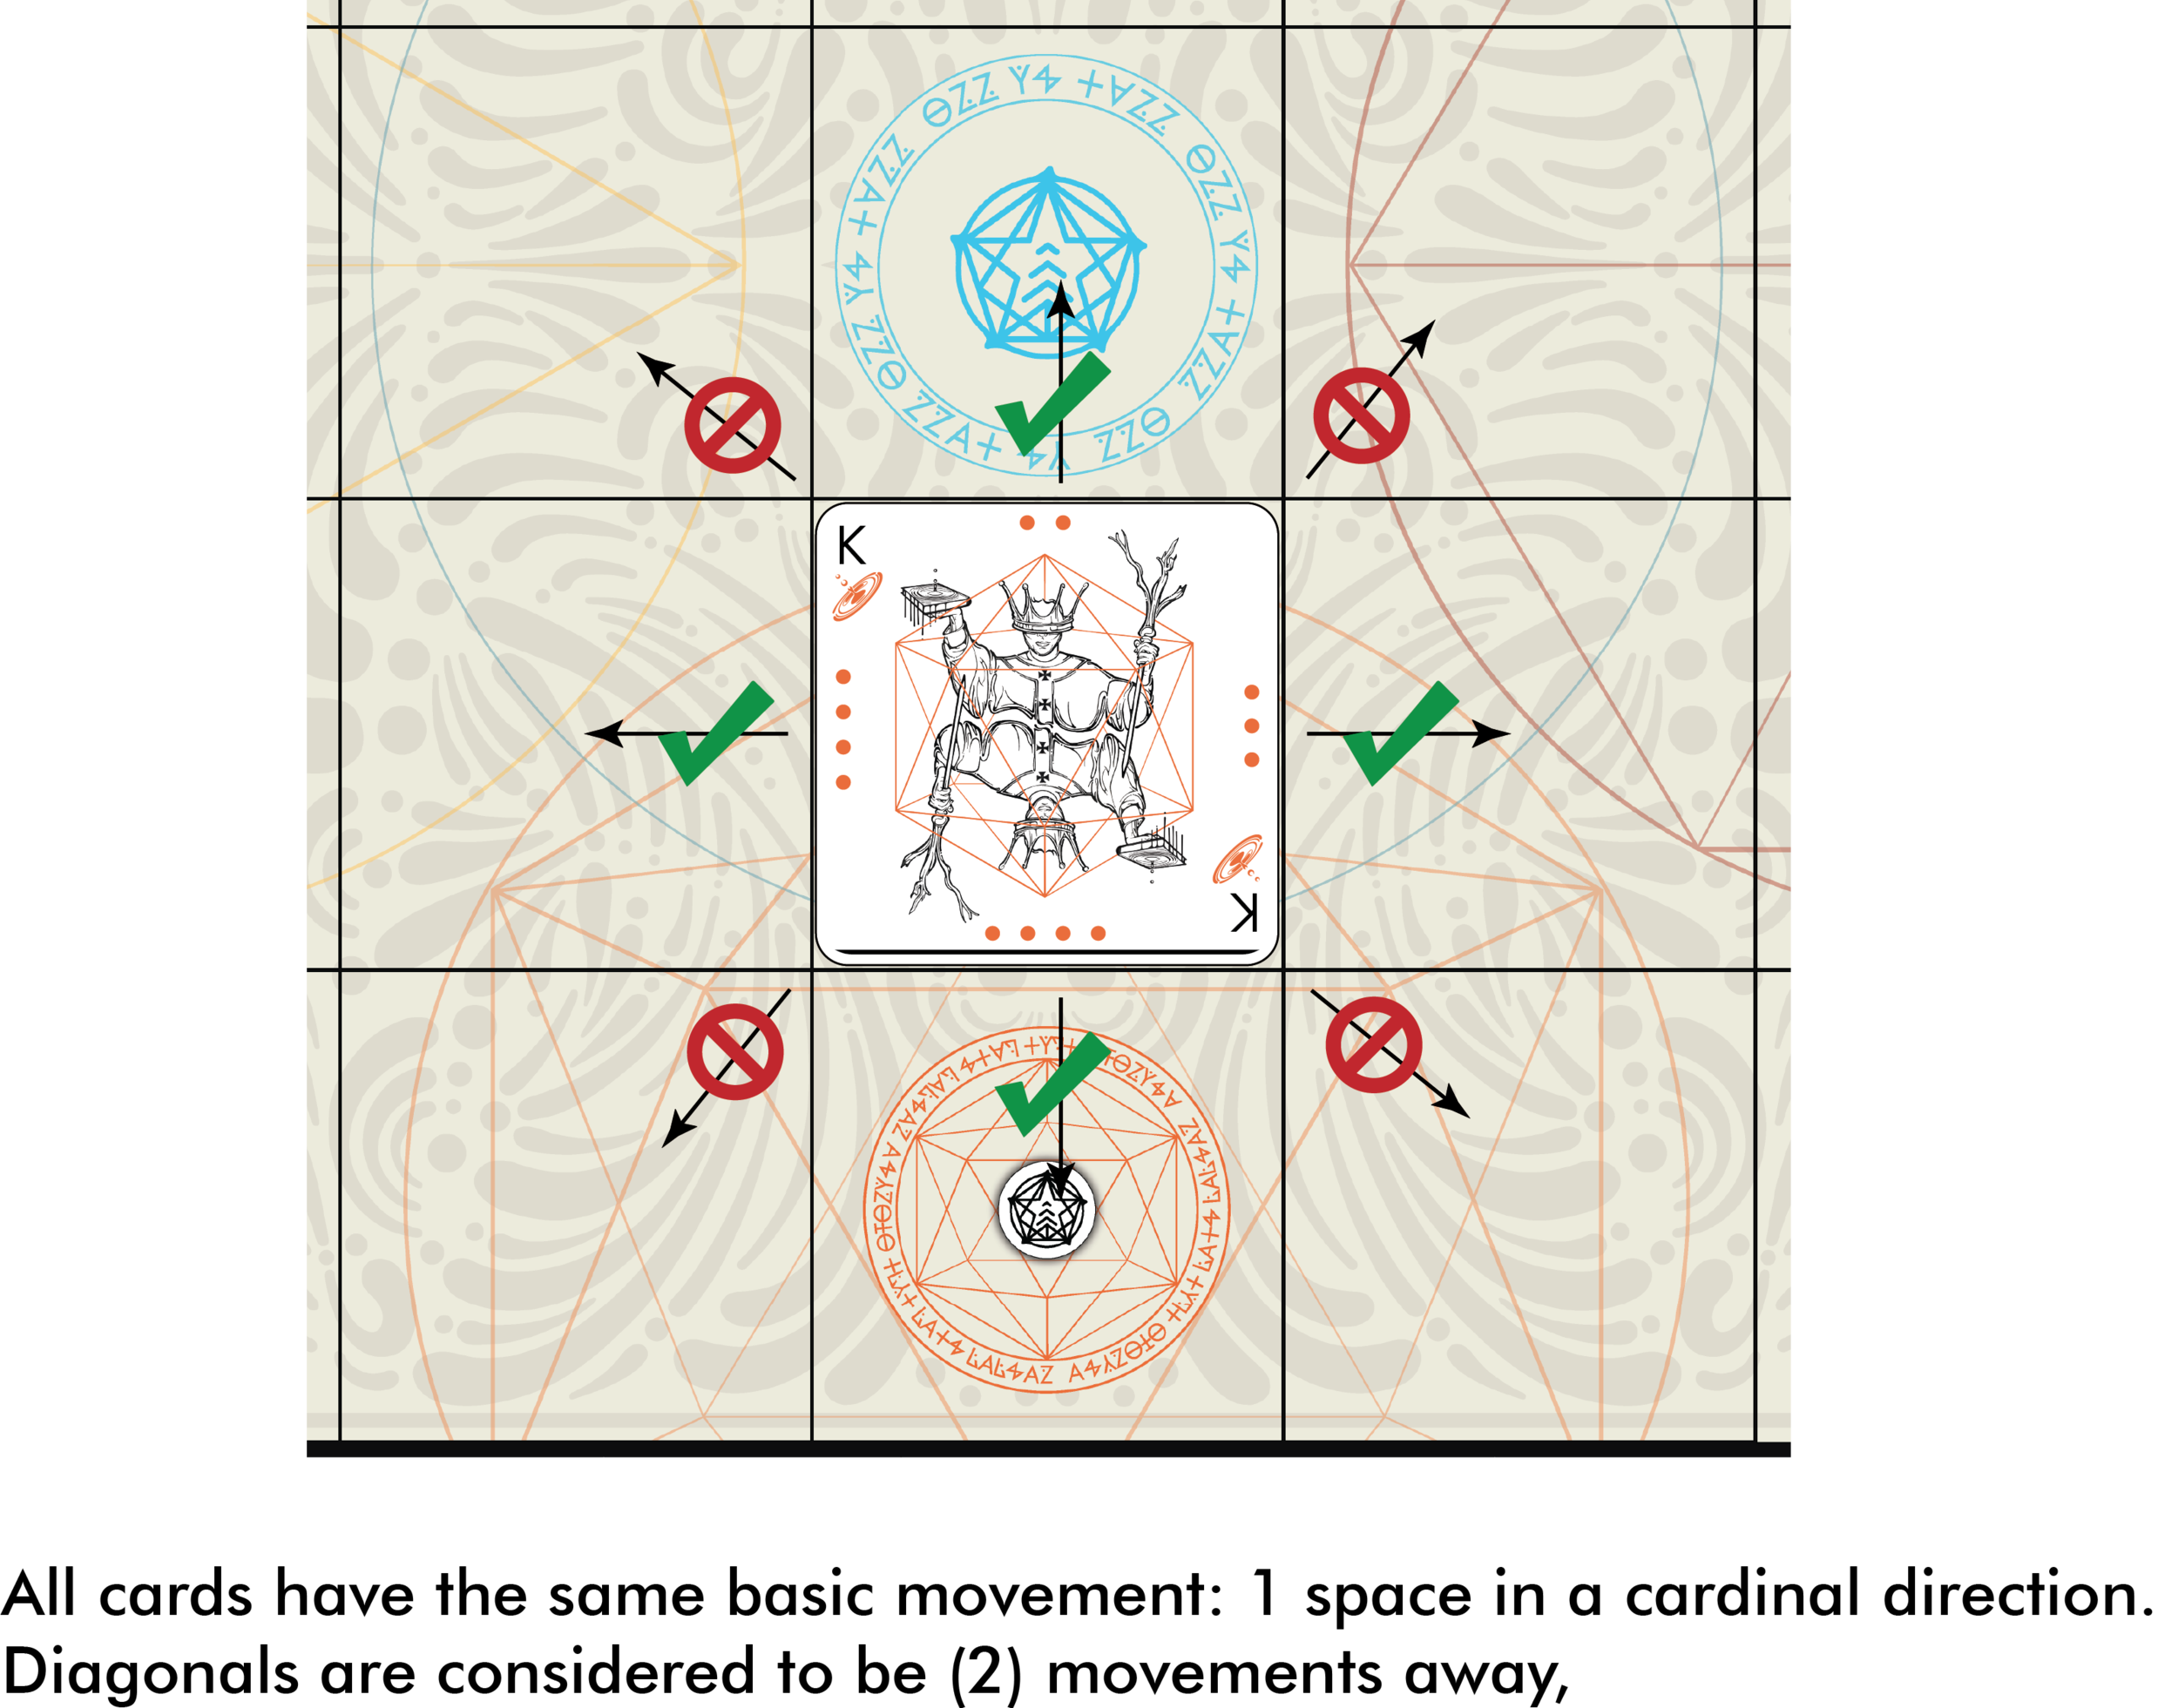 Fig. 1.6: Movement